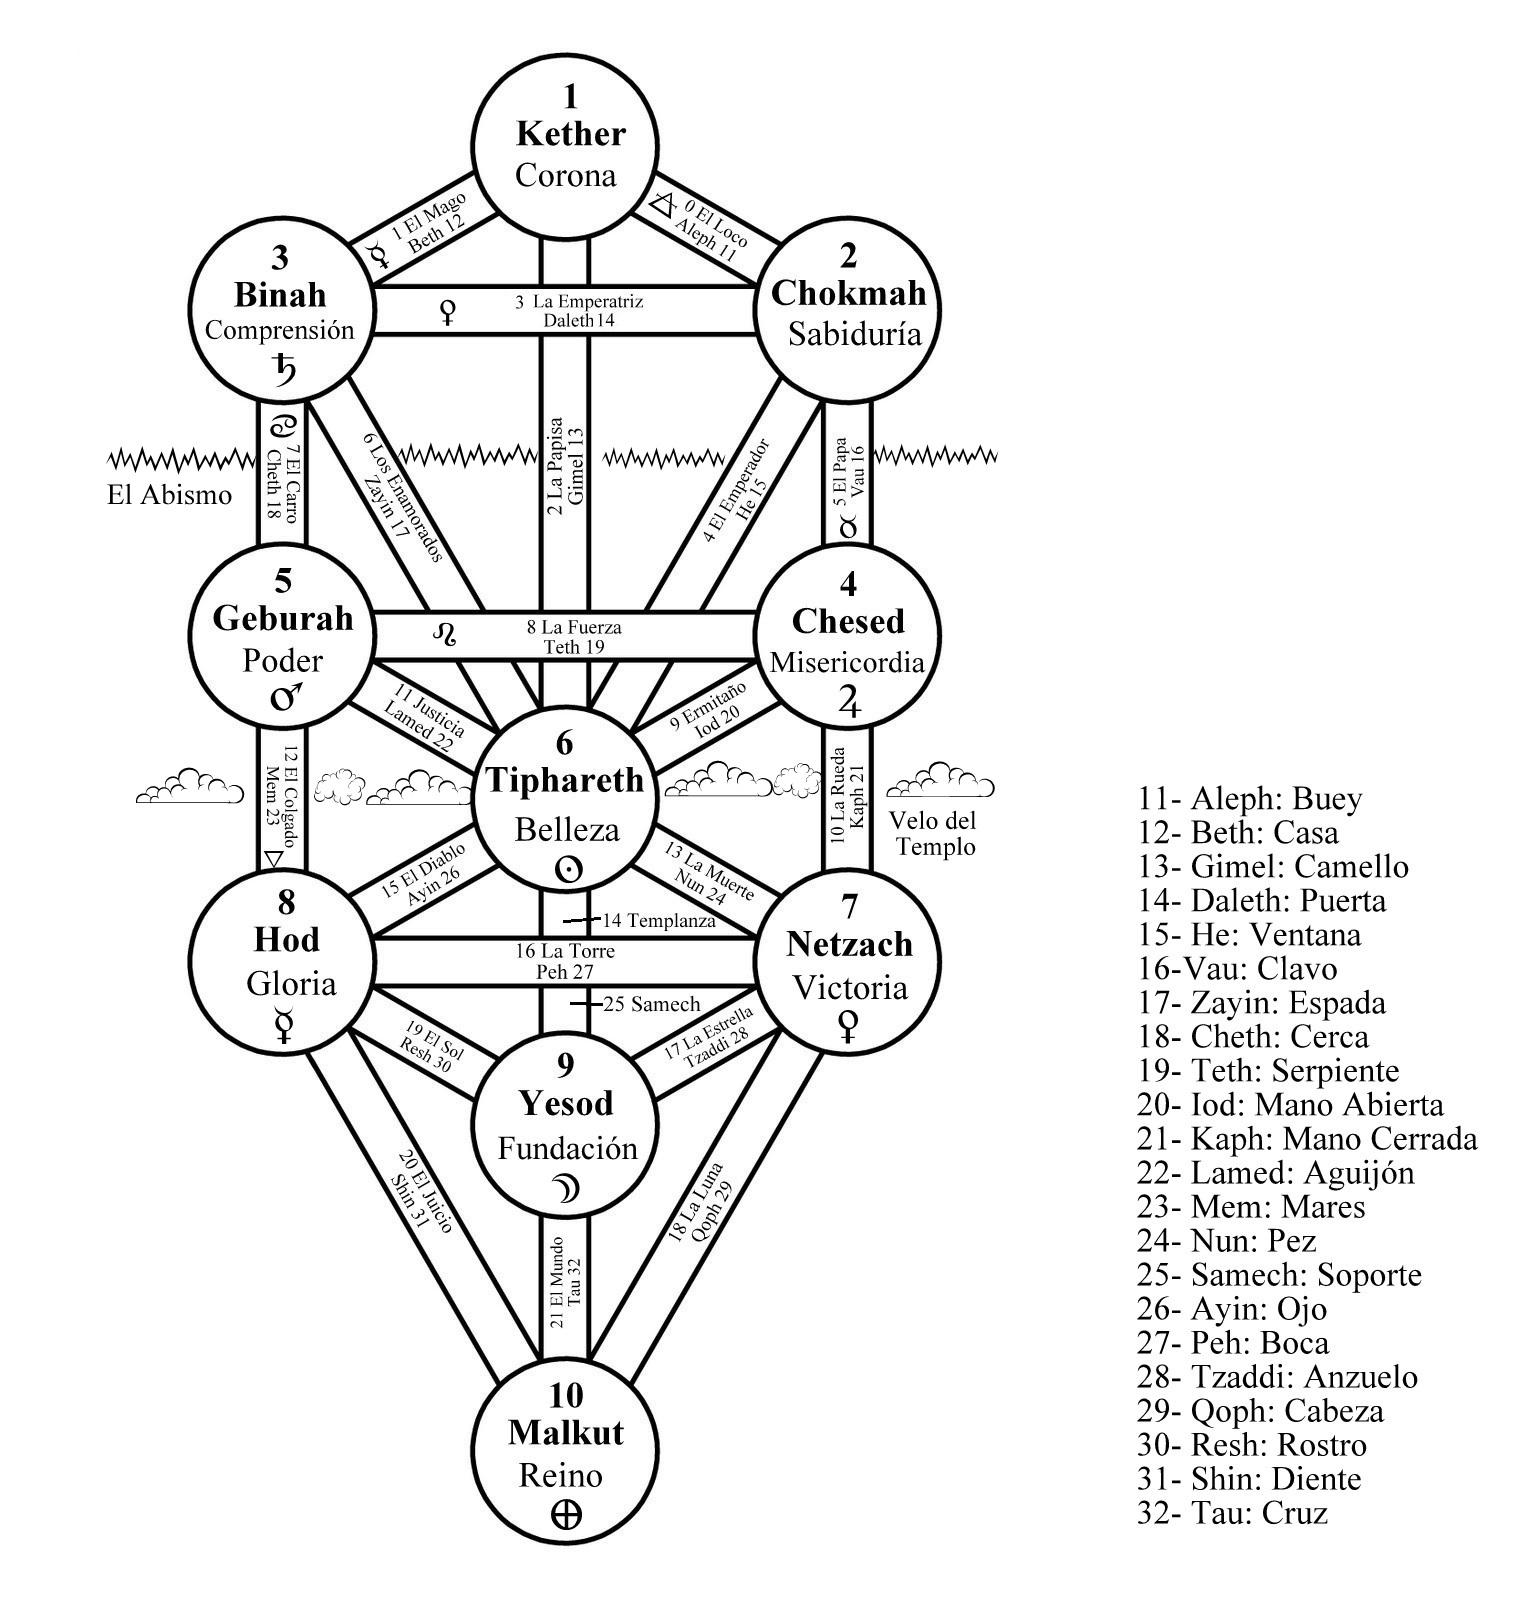 La Manzana Dorada Lectura De Illuminatus Semana 46